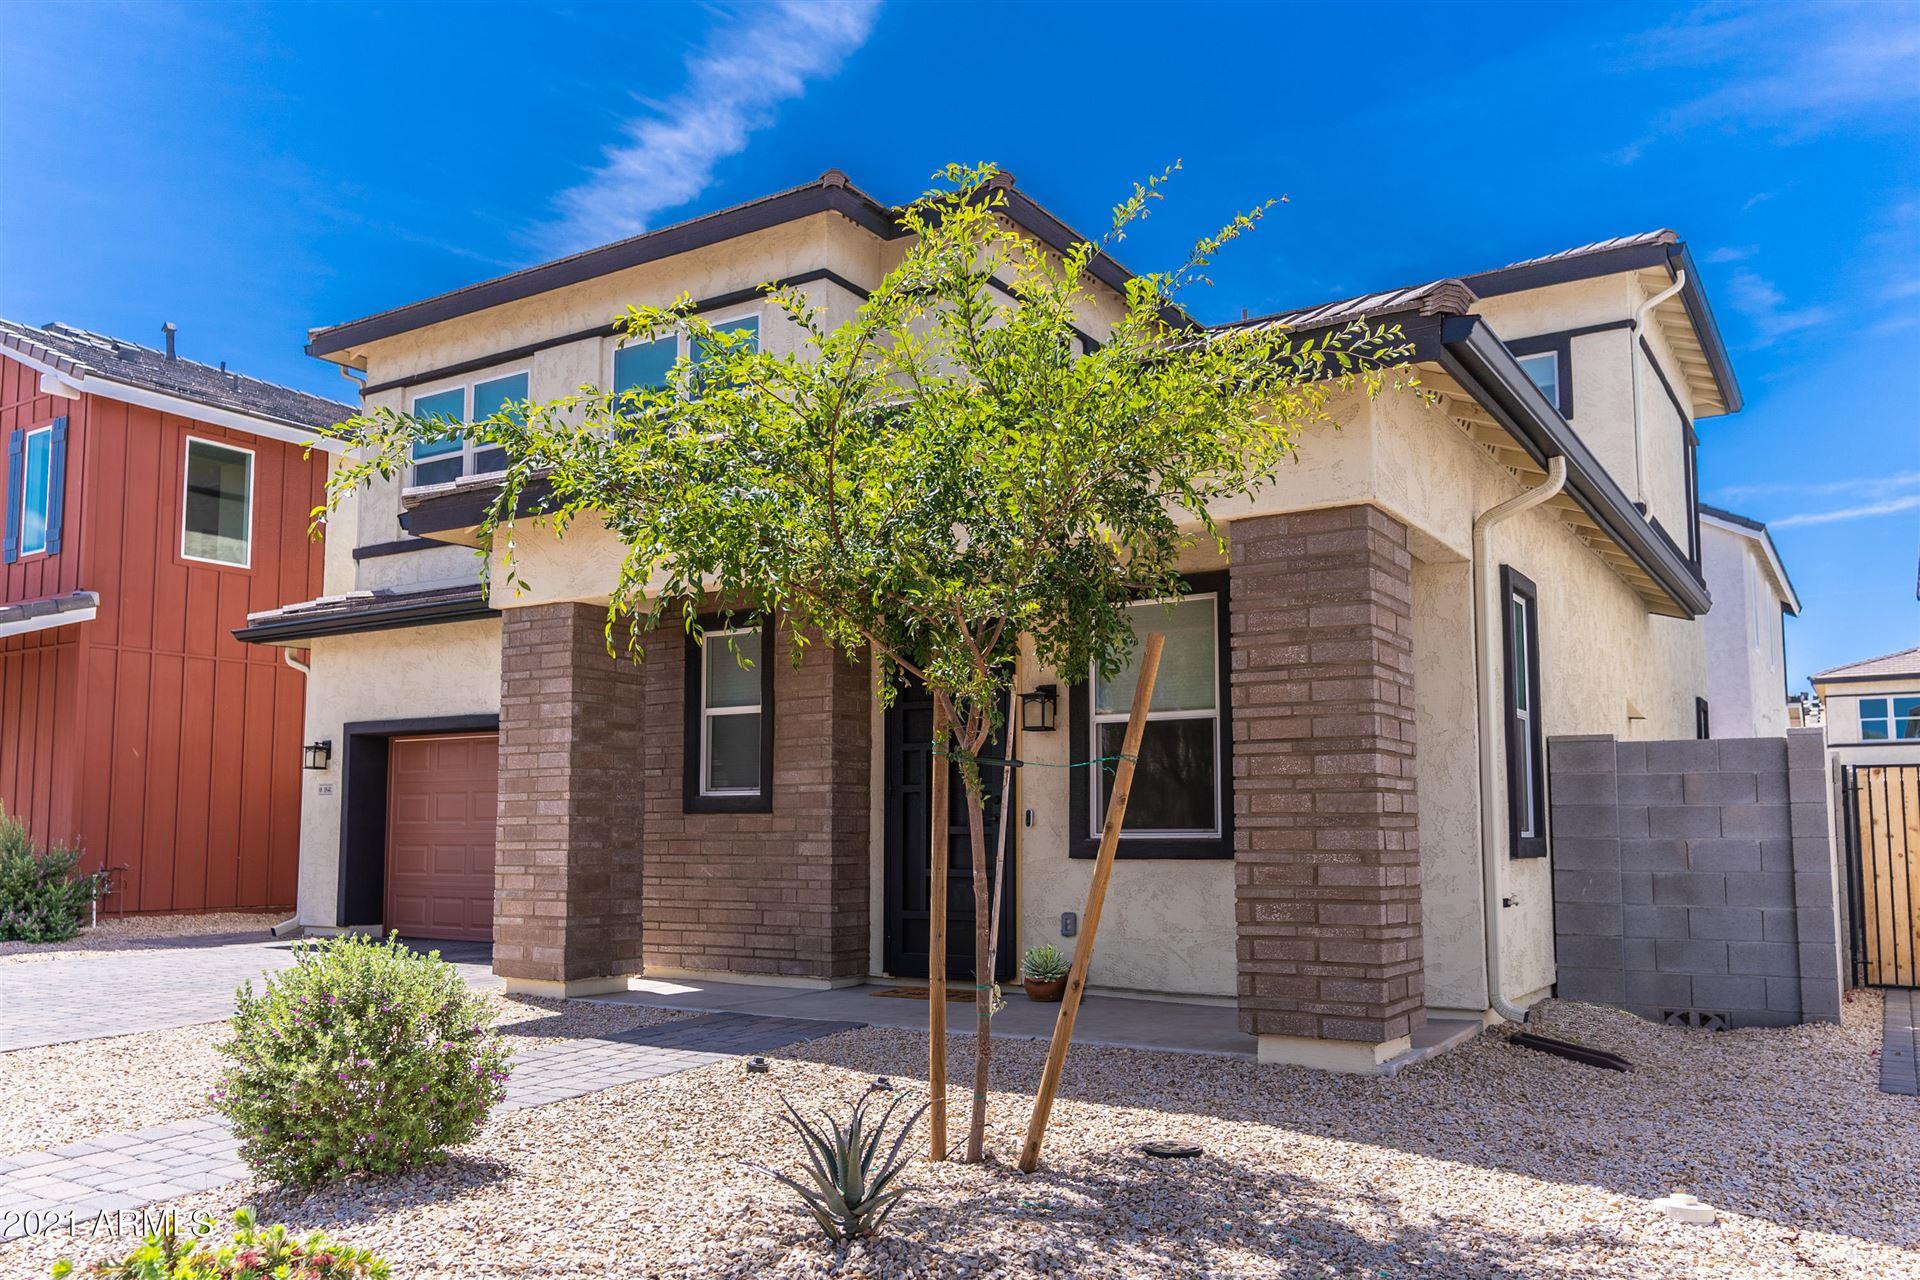 Photo of 1841 W 20TH Avenue, Apache Junction, AZ 85120 (MLS # 6241944)